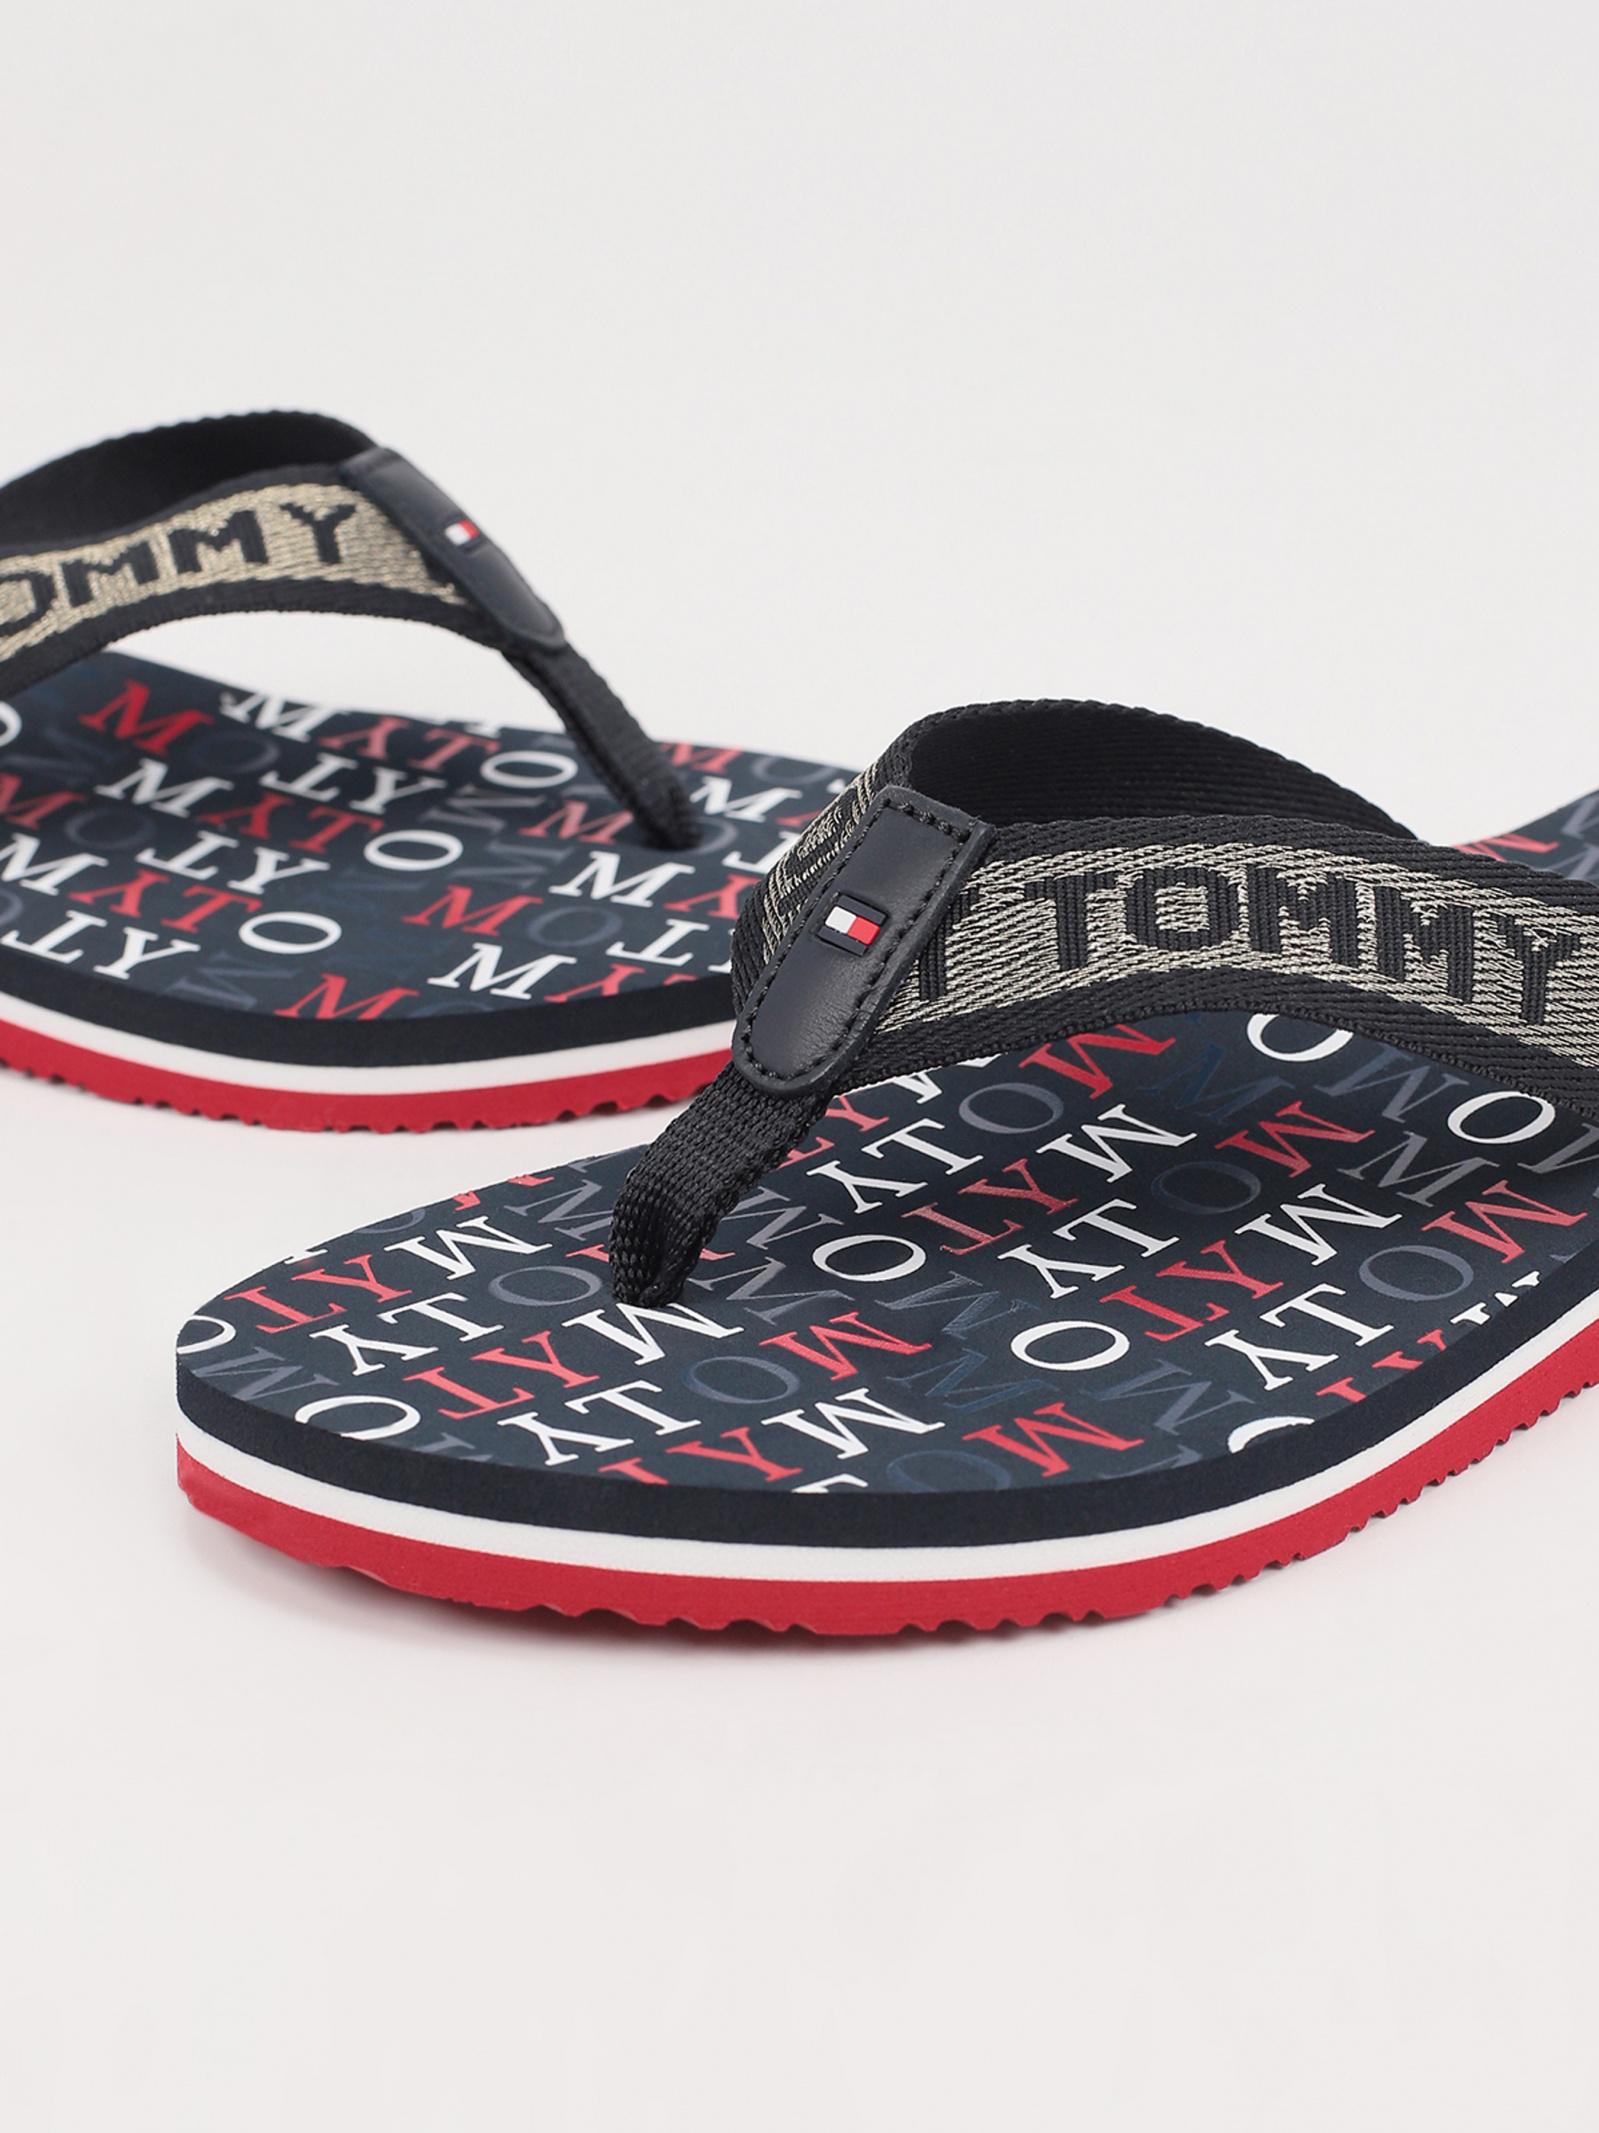 Шльопанці  для жінок Tommy Hilfiger TOMMY METALLIC FLAT BEACH SAND FW0FW04807-0KP ціна, 2017